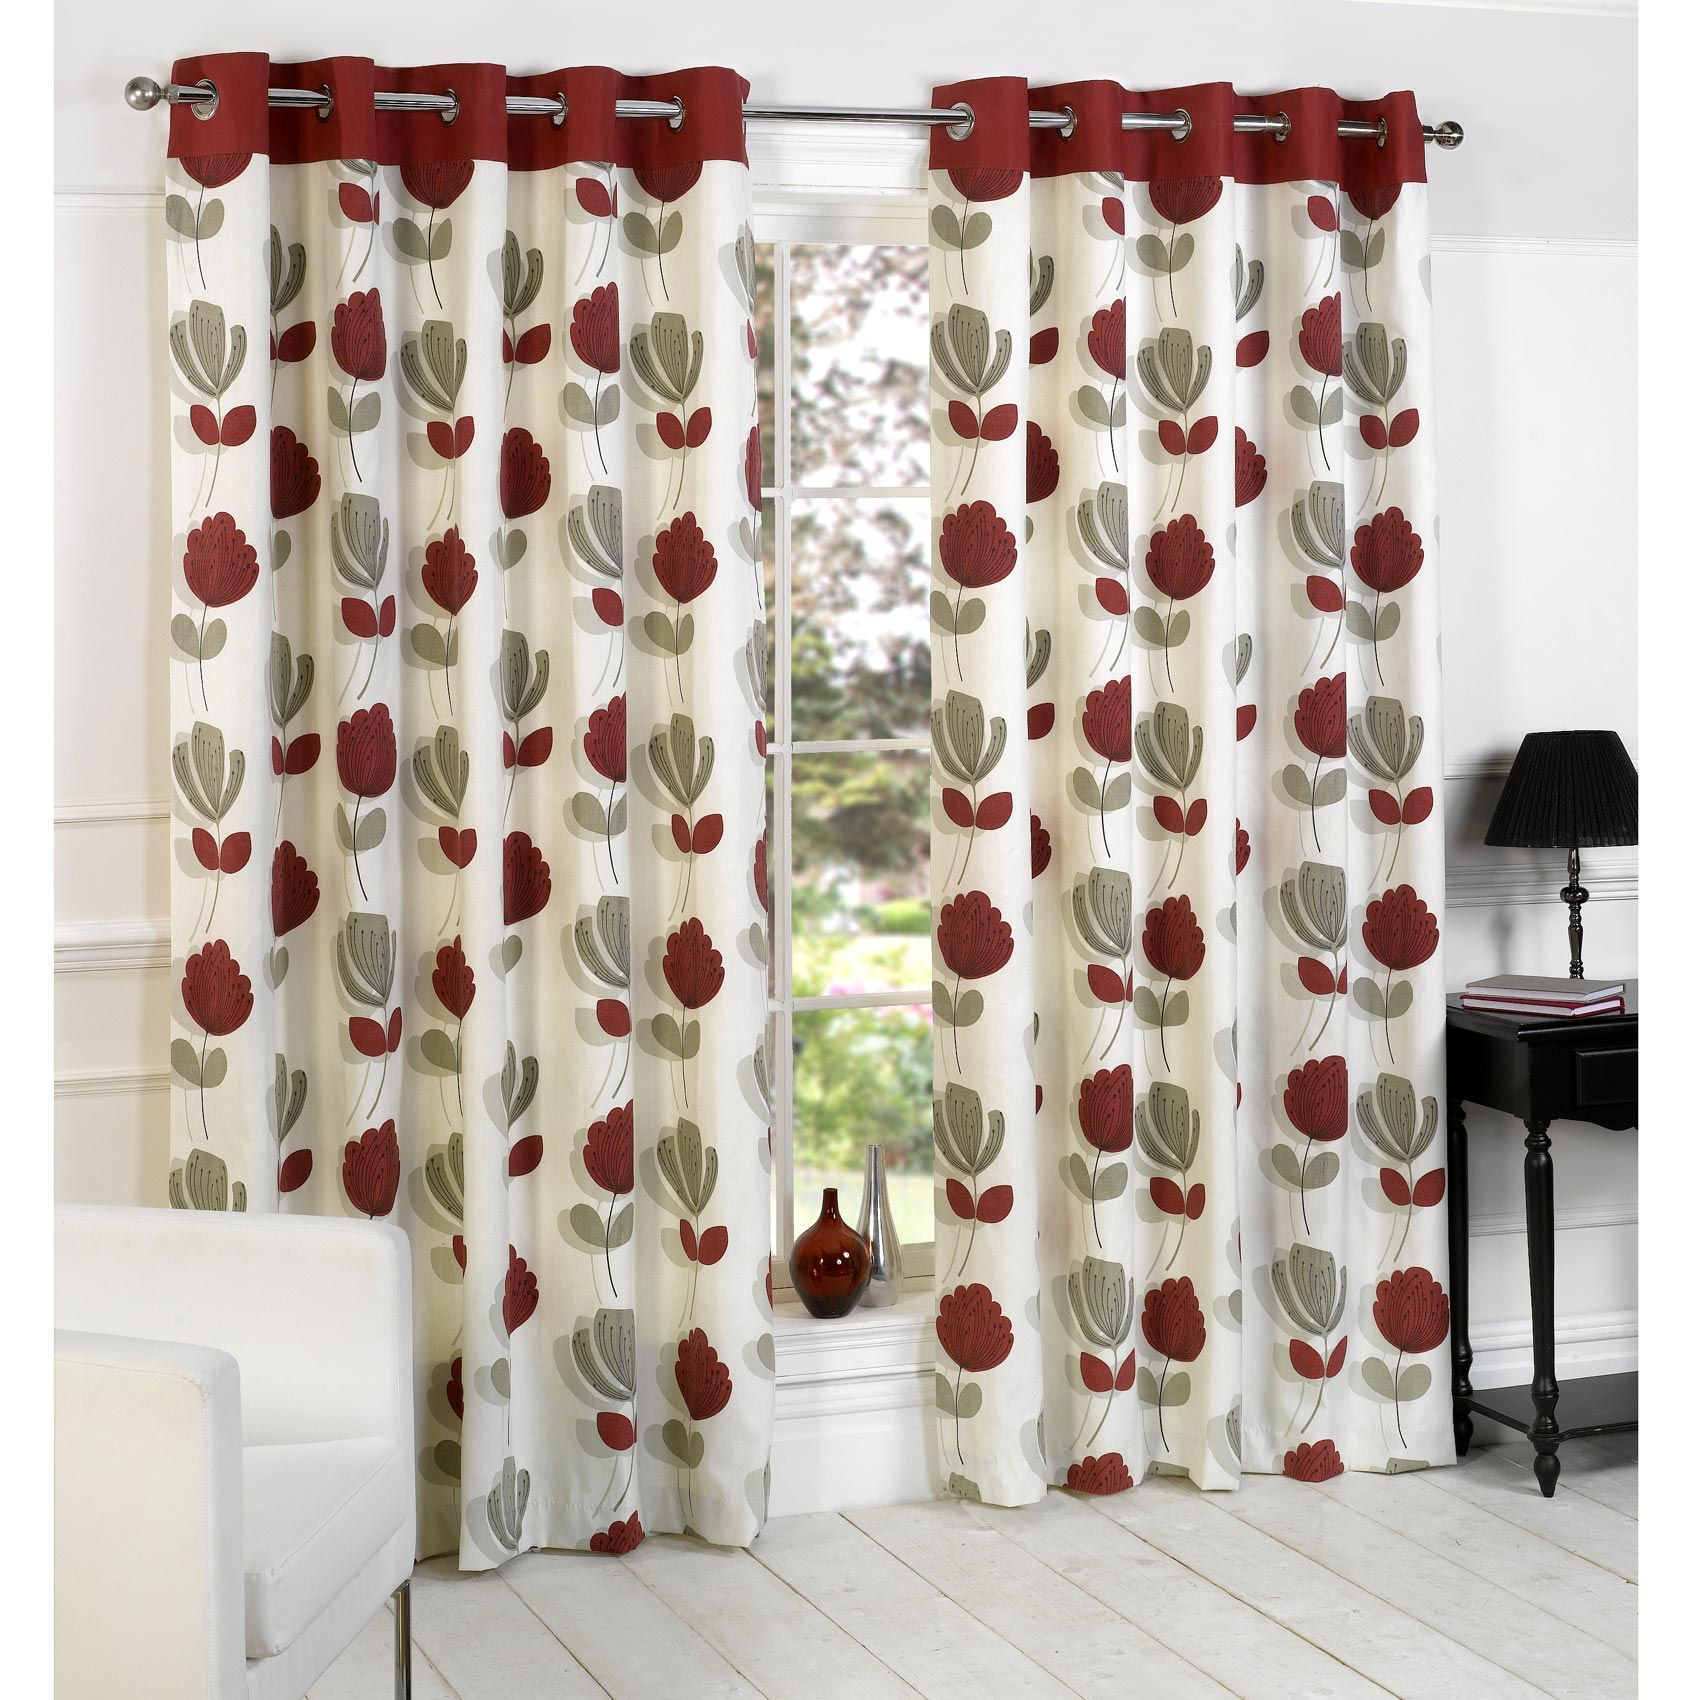 Lotti Modern Floral Print Eyelet Curtains, Cream / Red